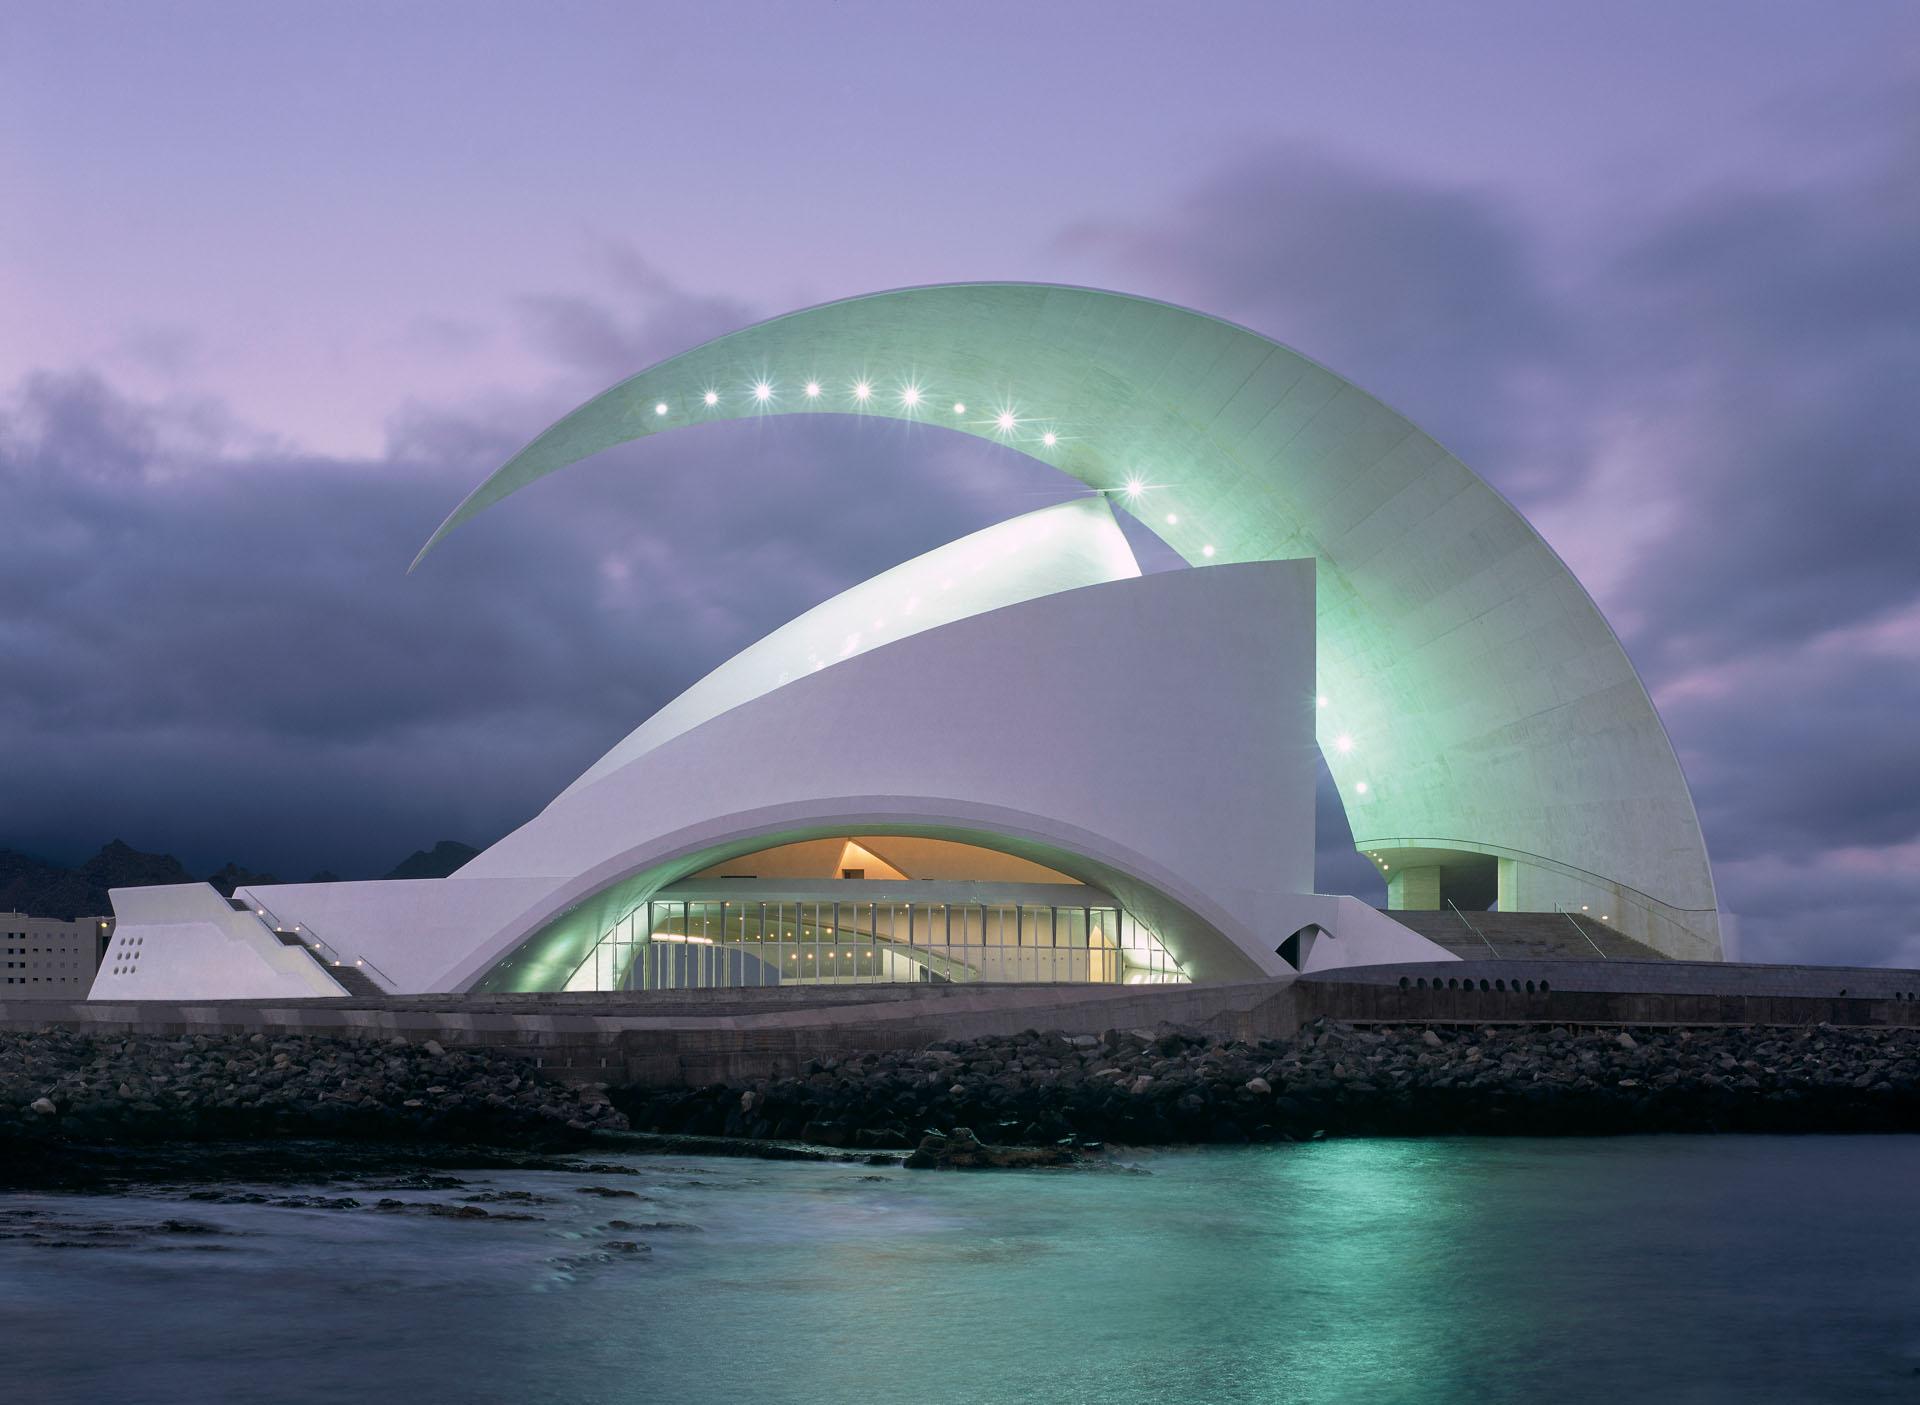 Adan Martin Auditorio de Tenerife / Santa Cruz de Tenerife ...  Adan Martin Aud...